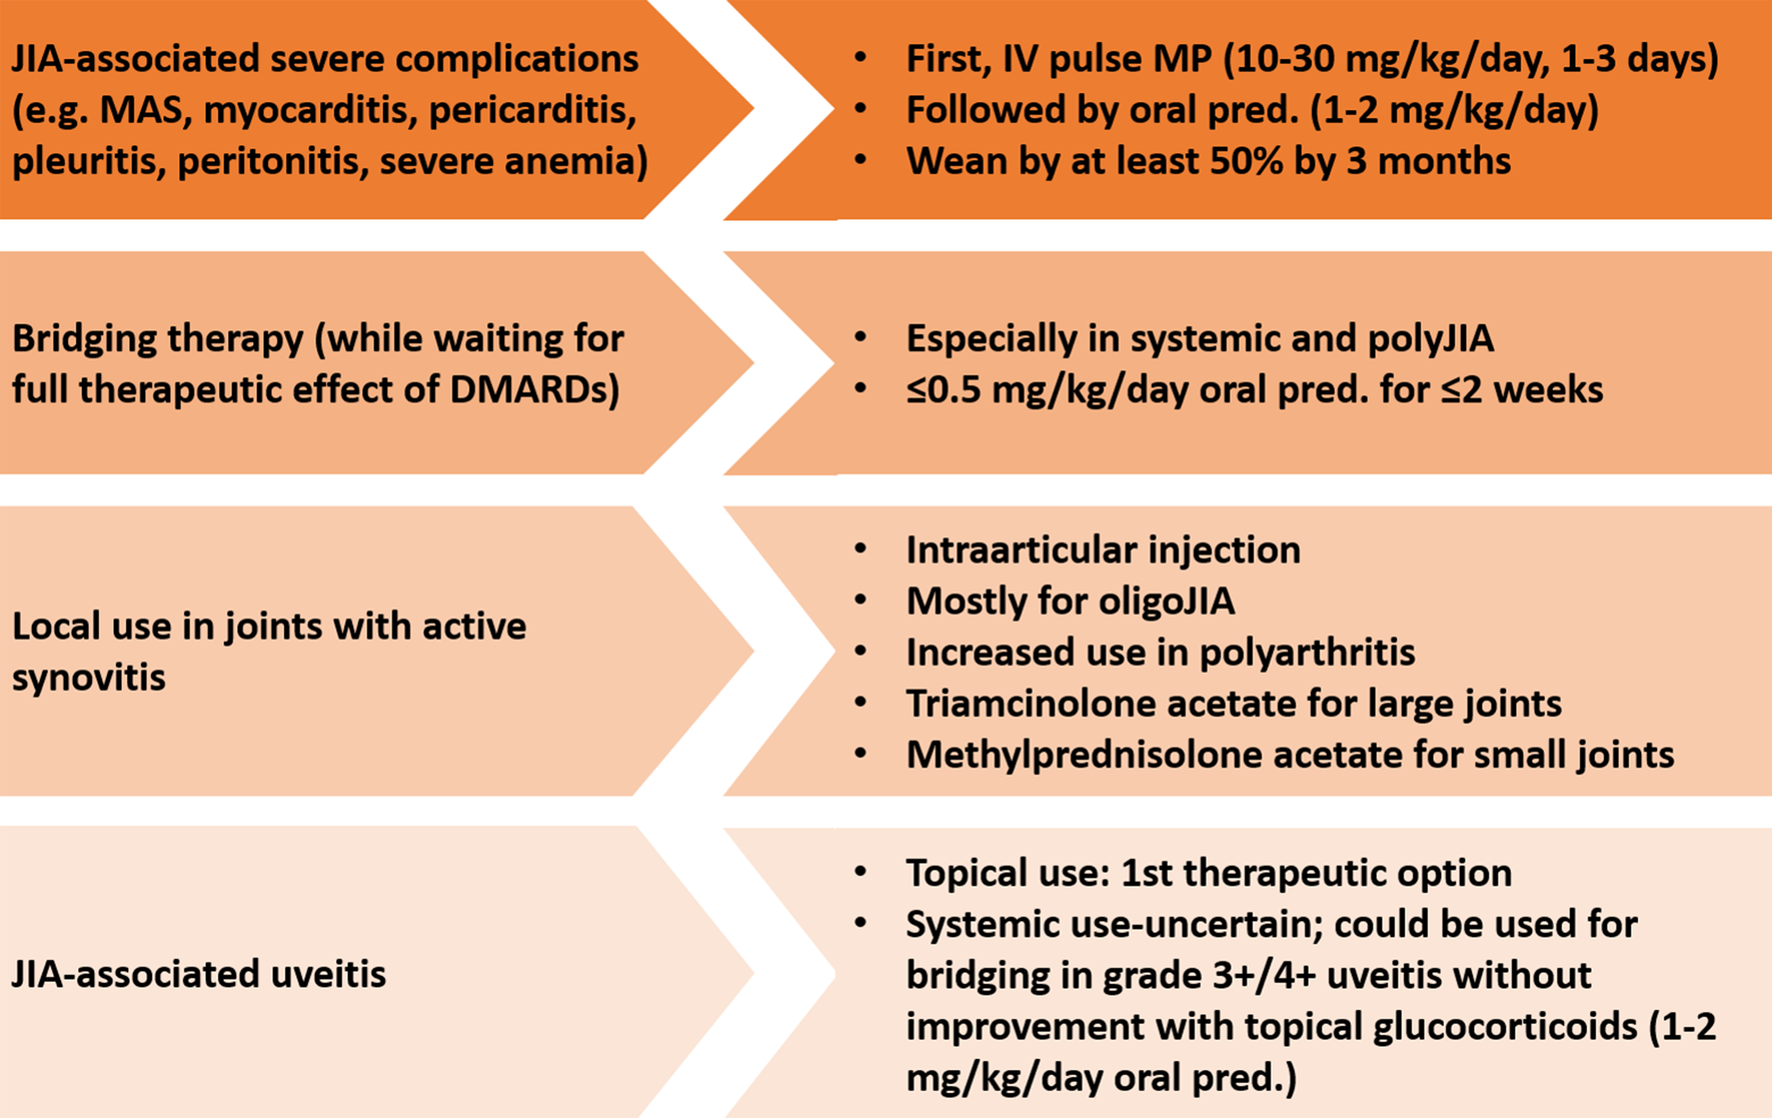 Glucocorticoid treatment in juvenile idiopathic arthritis